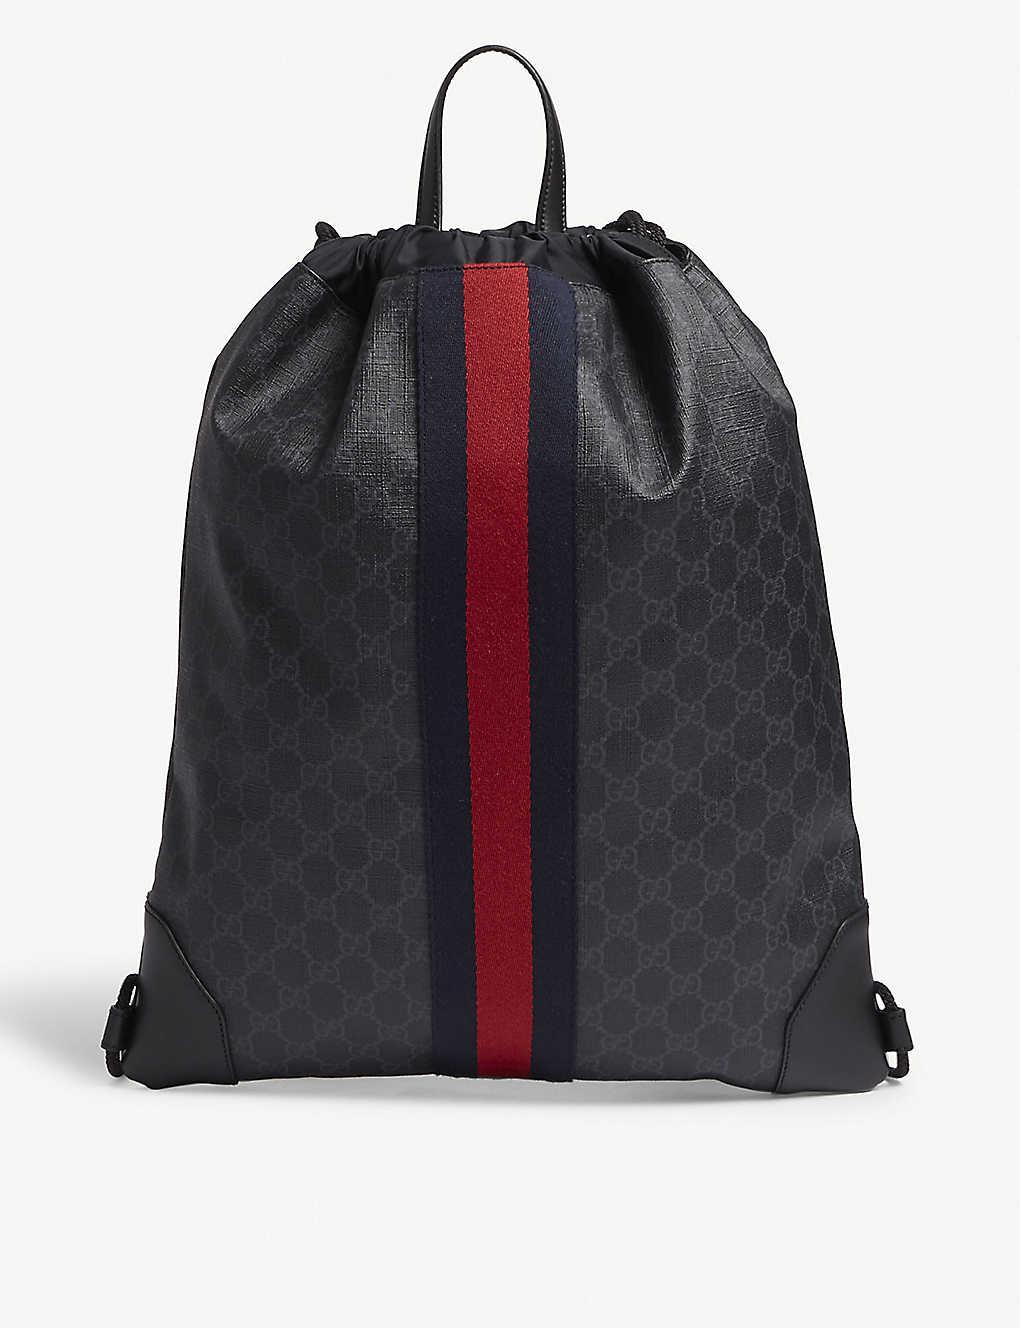 84998c9e382d GUCCI - Web stripe leather drawstring bag | Selfridges.com